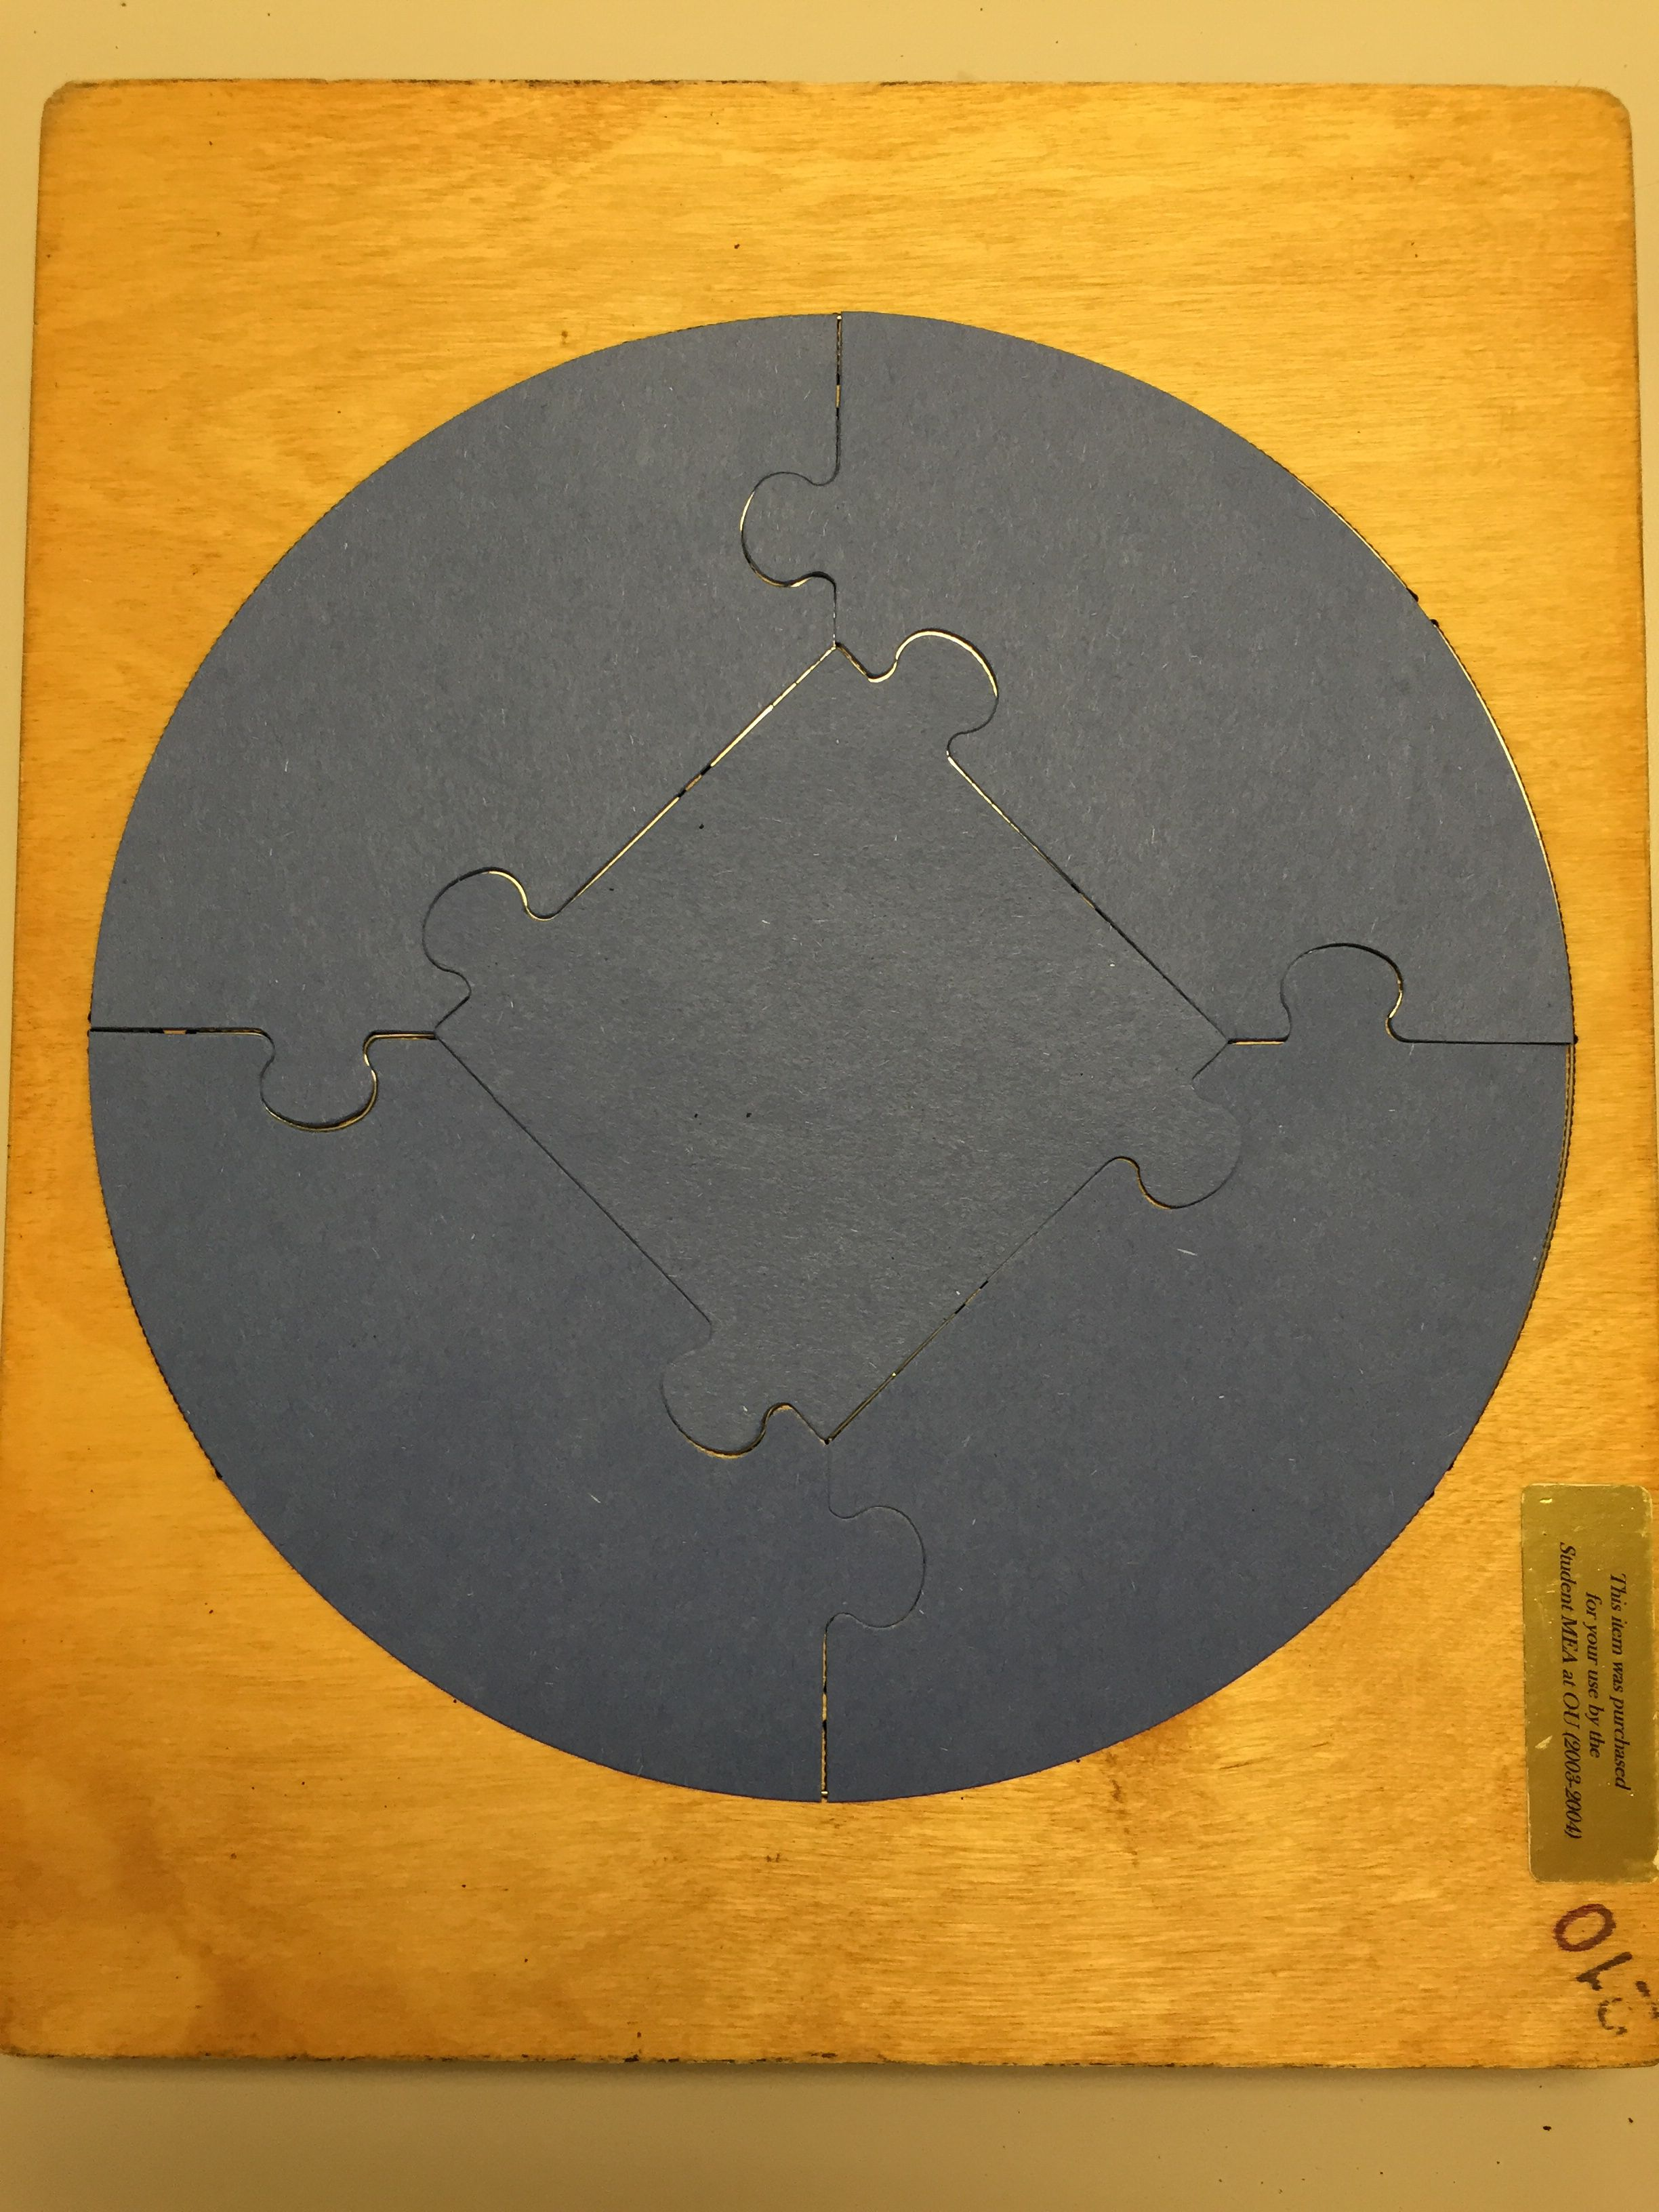 5 piece, circle puzzle